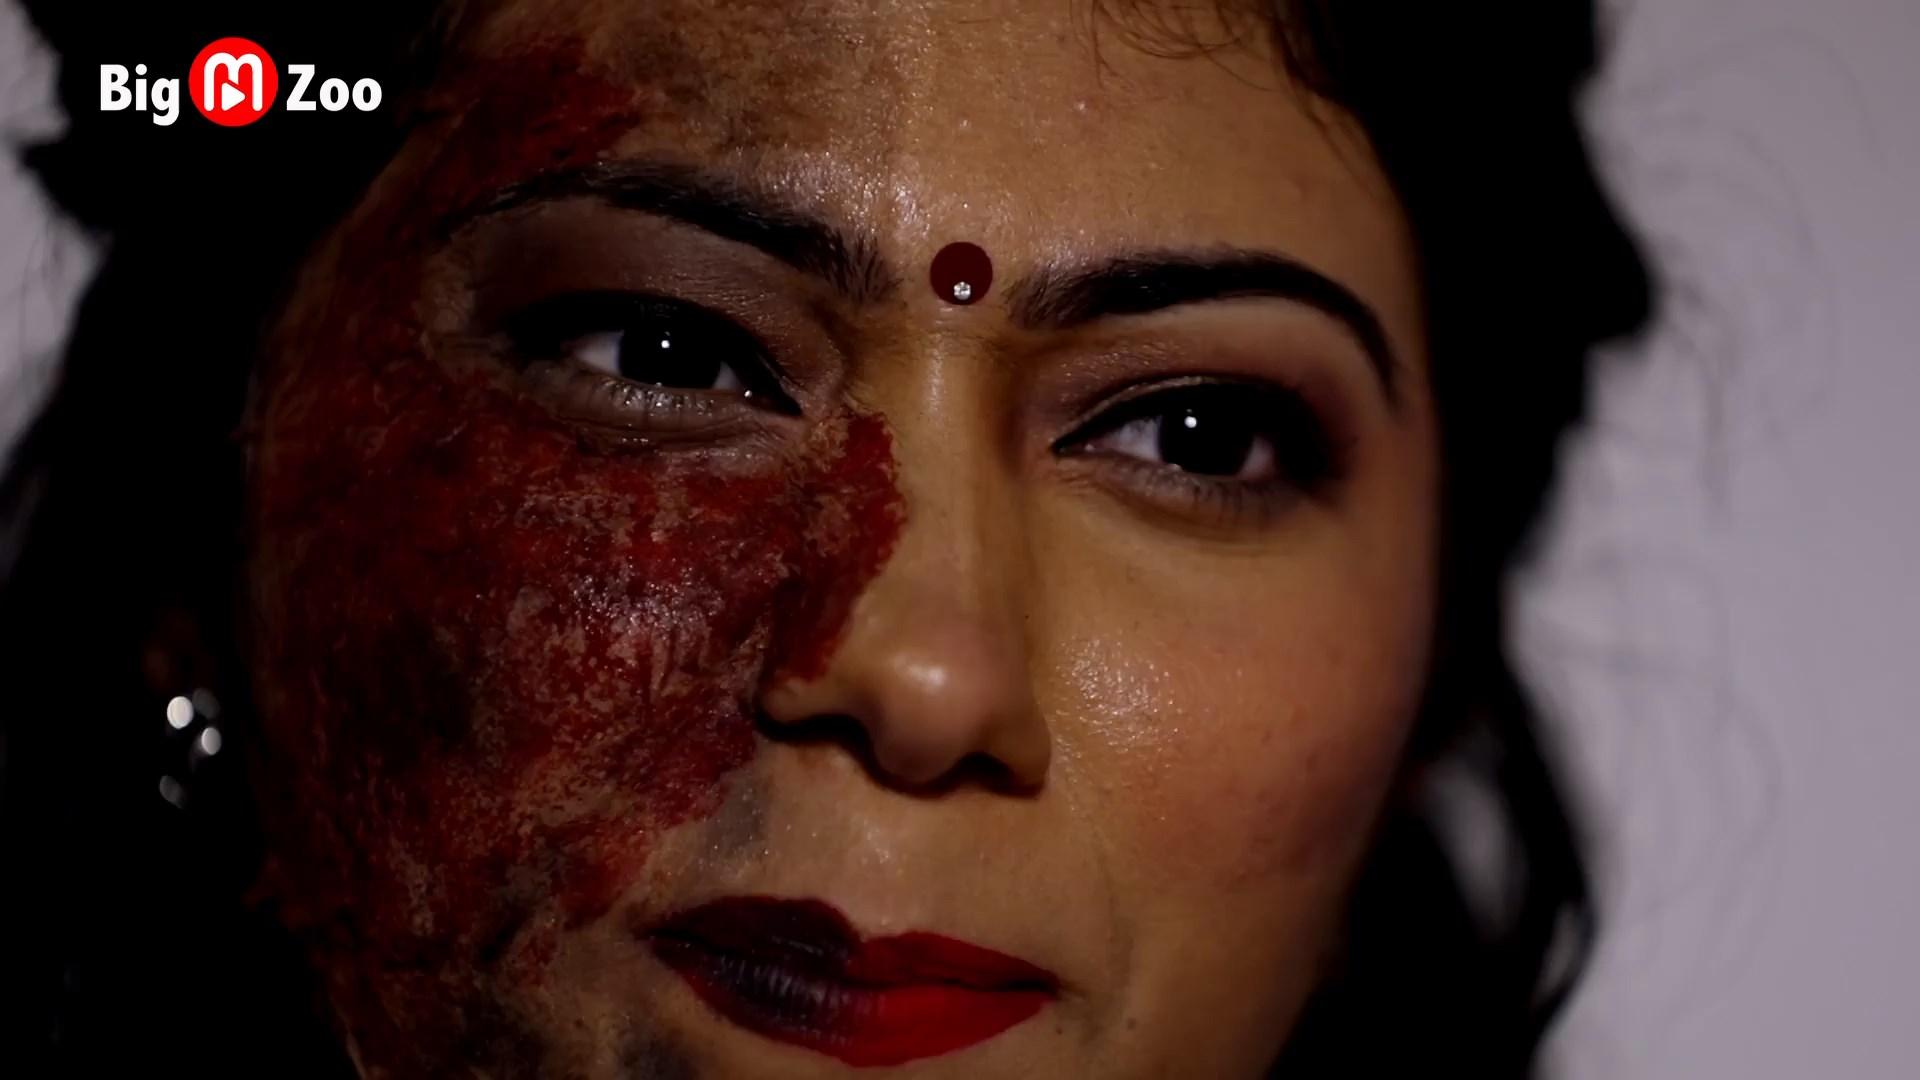 rh 13 - 18+ Rooh 2020 Big Movie Zoo App Originals Hindi Short Film 720p HDRip 70MB x264 AAC